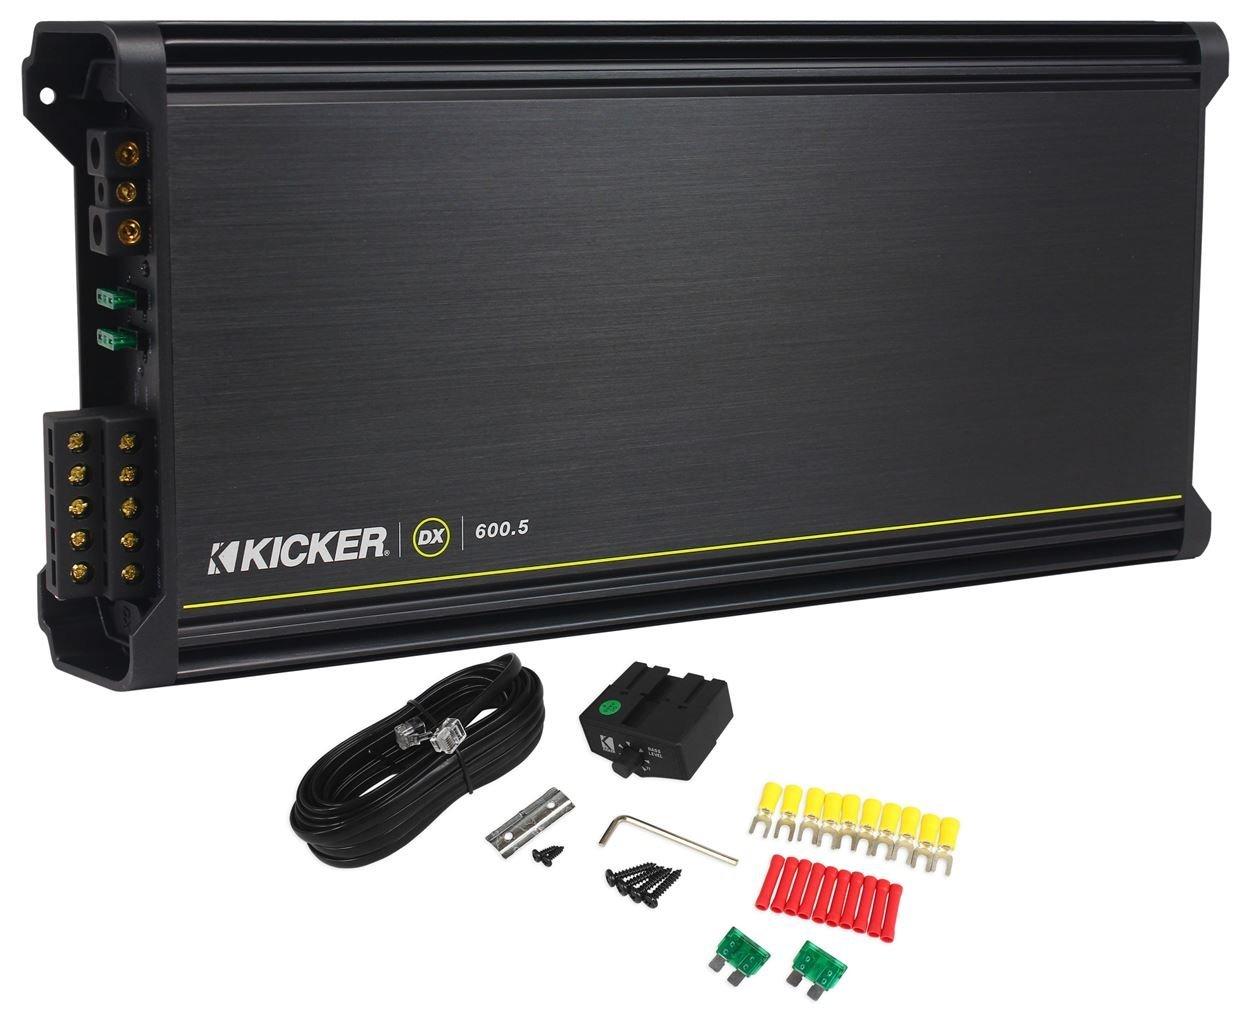 Amazon kicker 11dx6005 600w 5 channel car amplifier power amazon kicker 11dx6005 600w 5 channel car amplifier power stereo ampremote 11dx6005 car electronics sciox Gallery